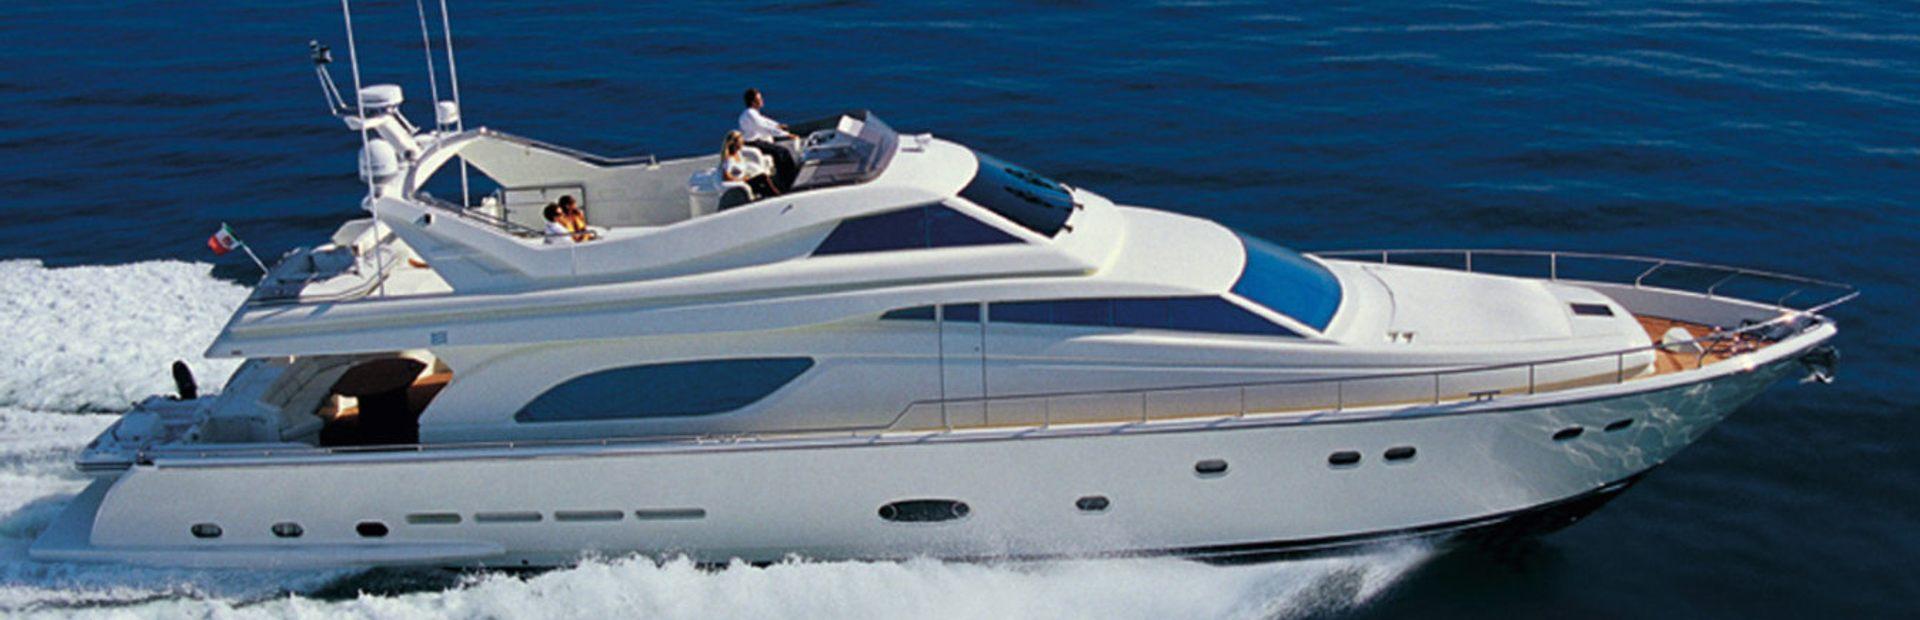 Ferretti Yachts 810 RPH Yacht Charter